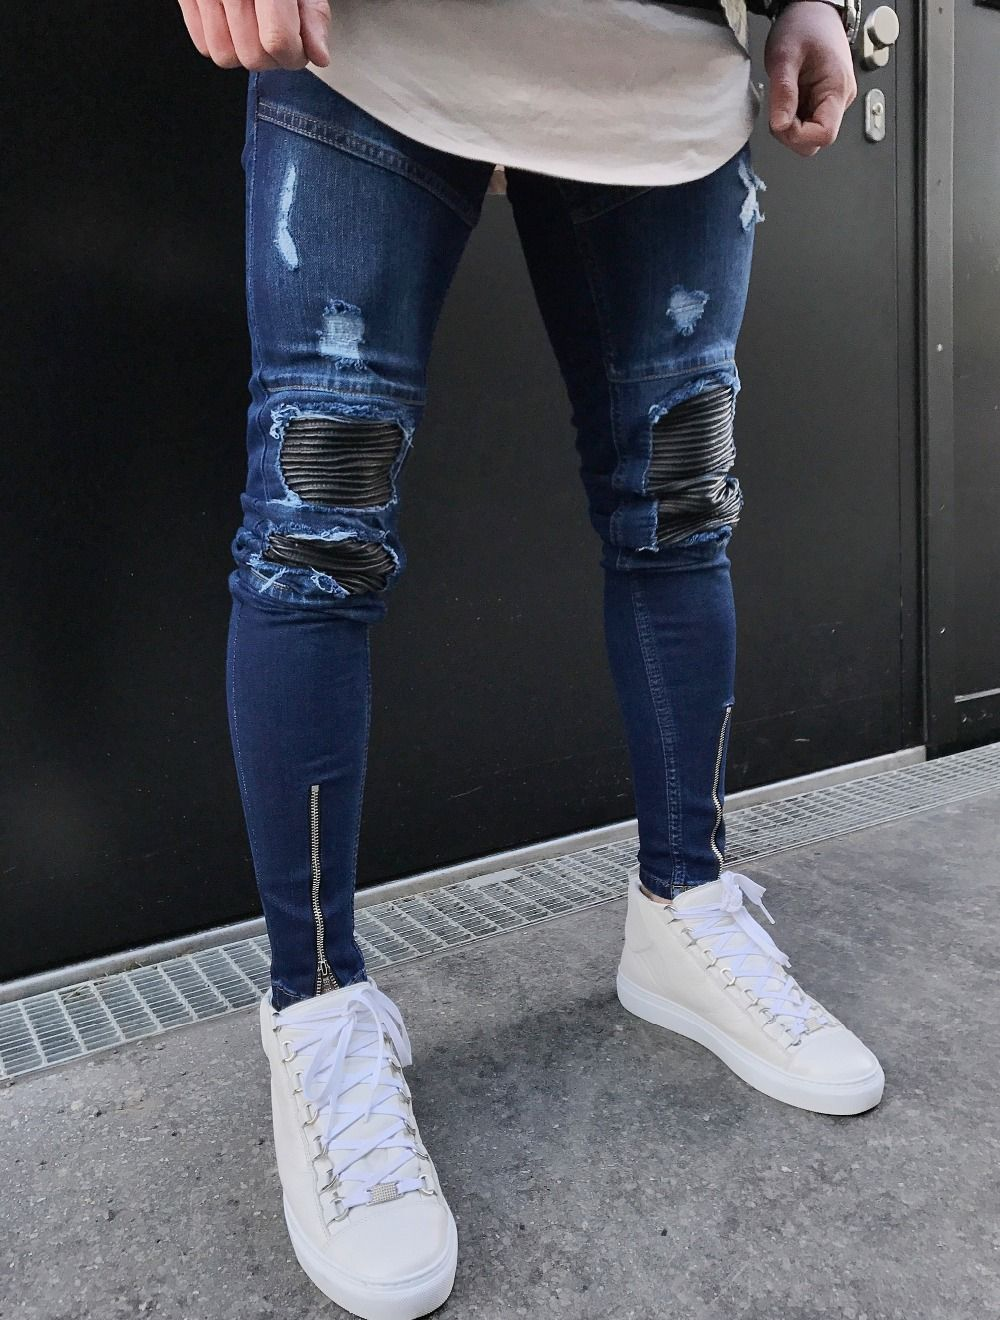 Blue Hem Zipper Stretch Knee Ripped Biker Jeans Men Hole Hip Hop Brand Clothing Skinny Jeans Pantalones De Hombre Moda Ropa Para Hombres Jovenes Jeans De Moda